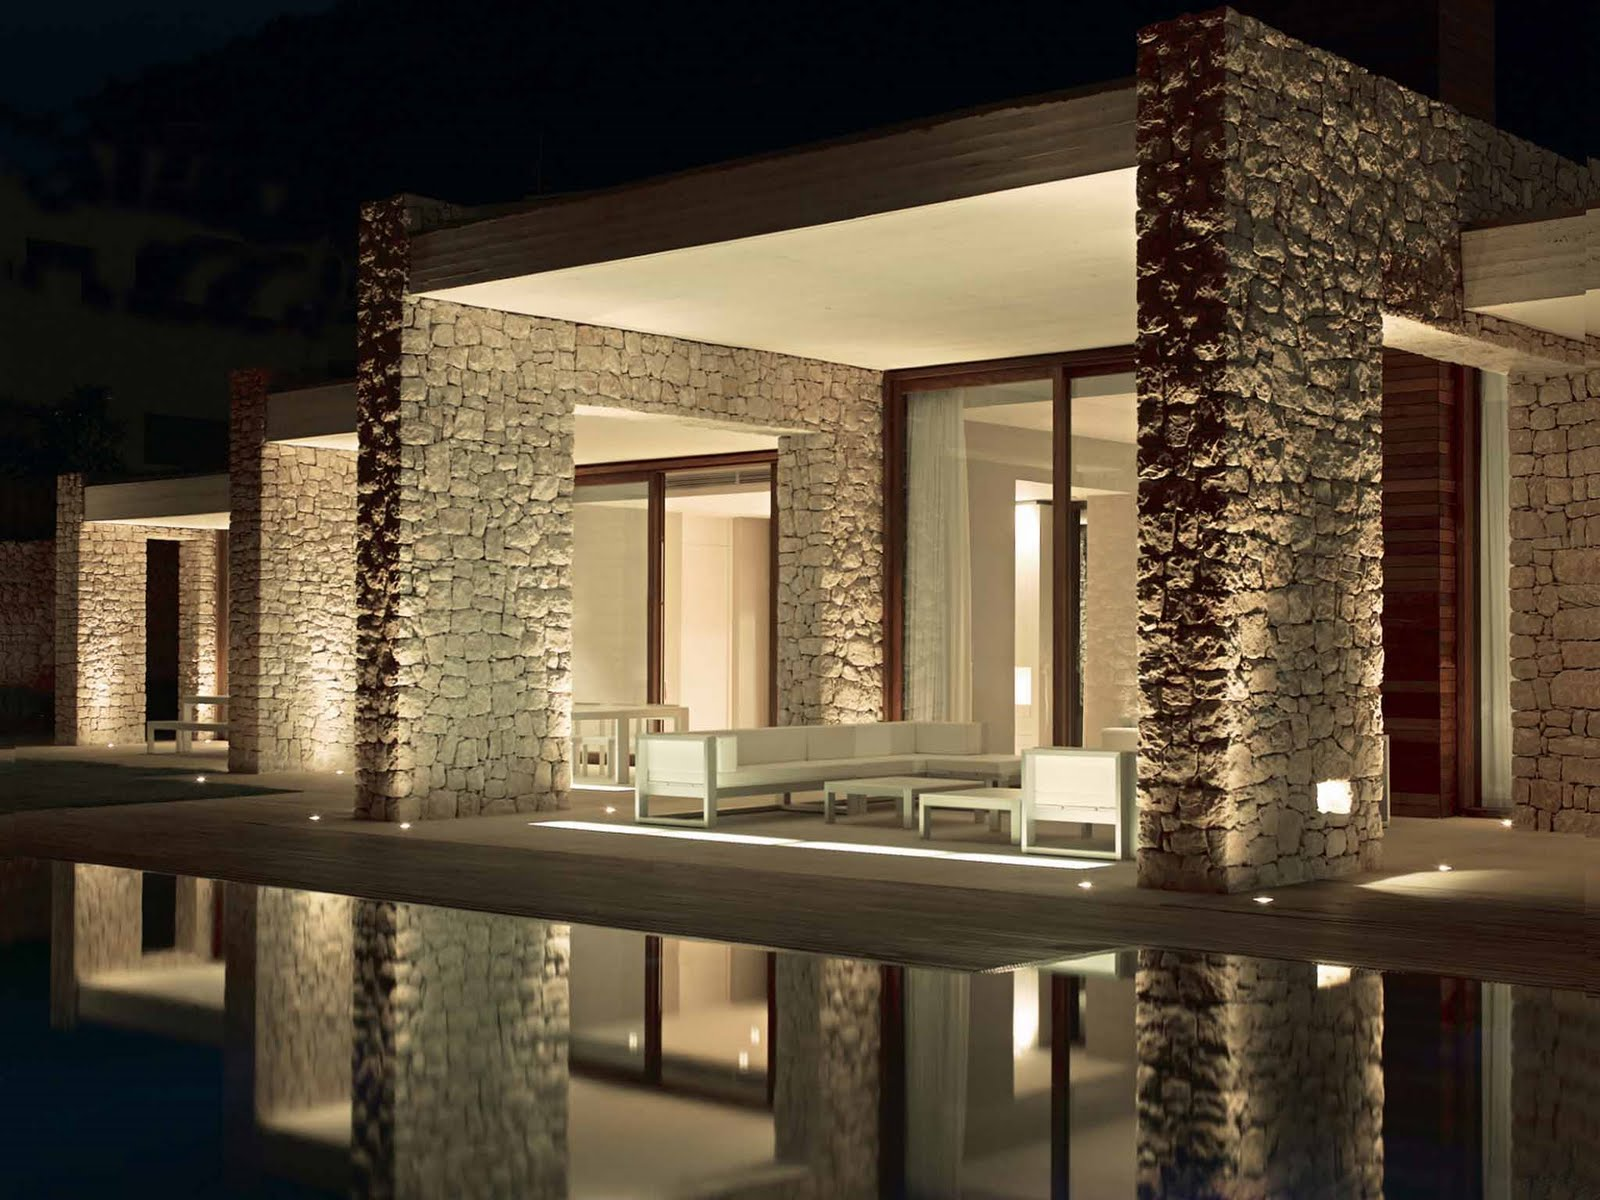 Arquitetura de ilumina o projeto de ilumina o residencial - Iluminacion para casa ...